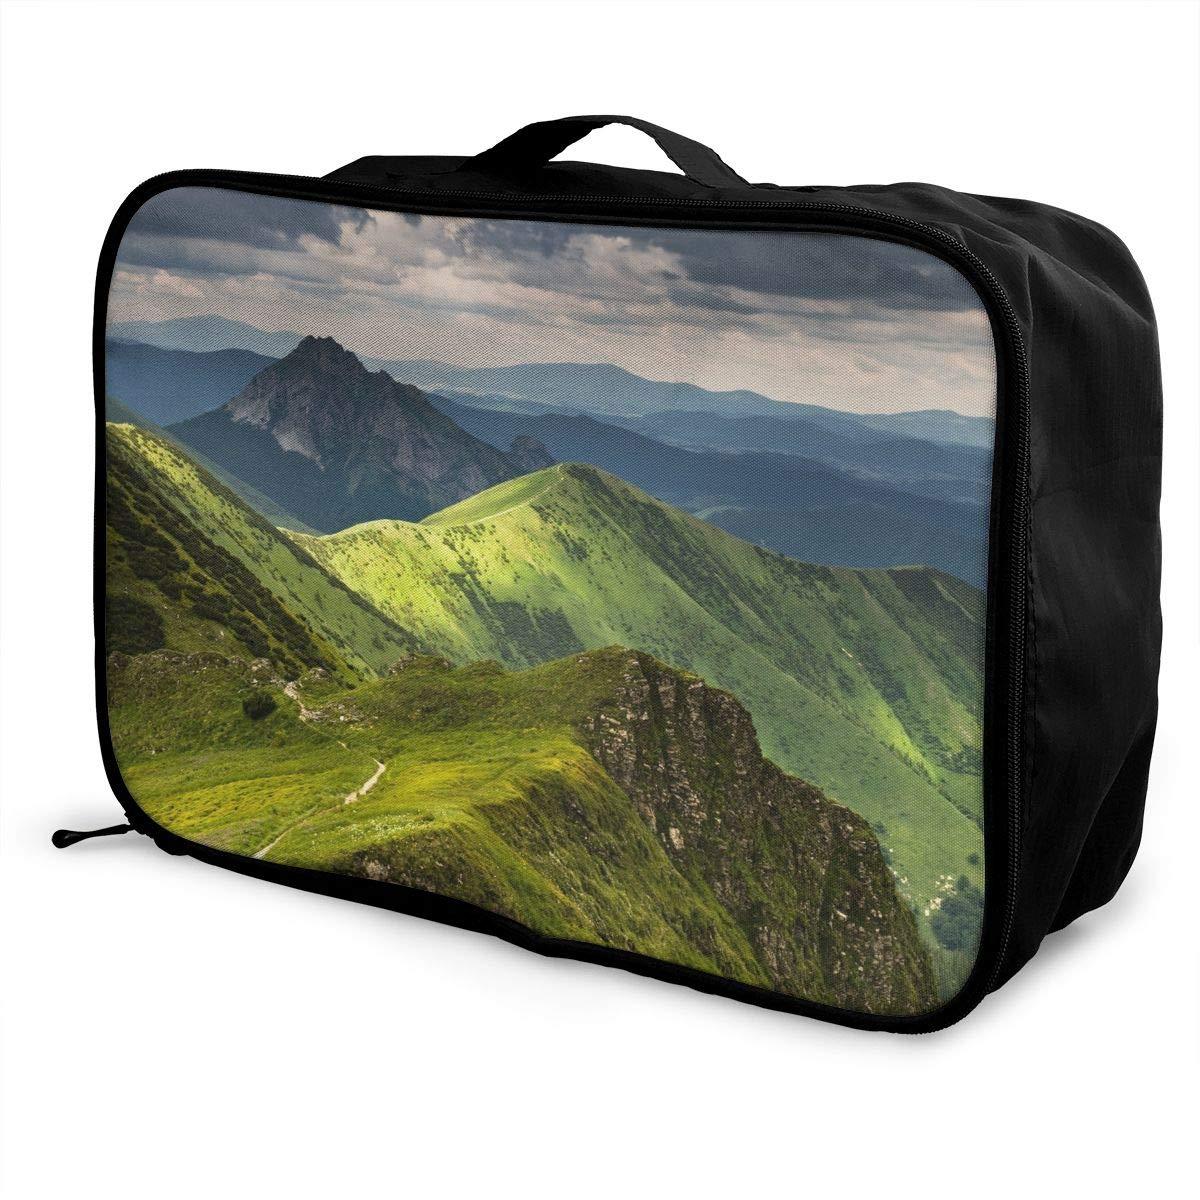 Travel Luggage Duffle Bag Lightweight Portable Handbag Mountains Print Large Capacity Waterproof Foldable Storage Tote